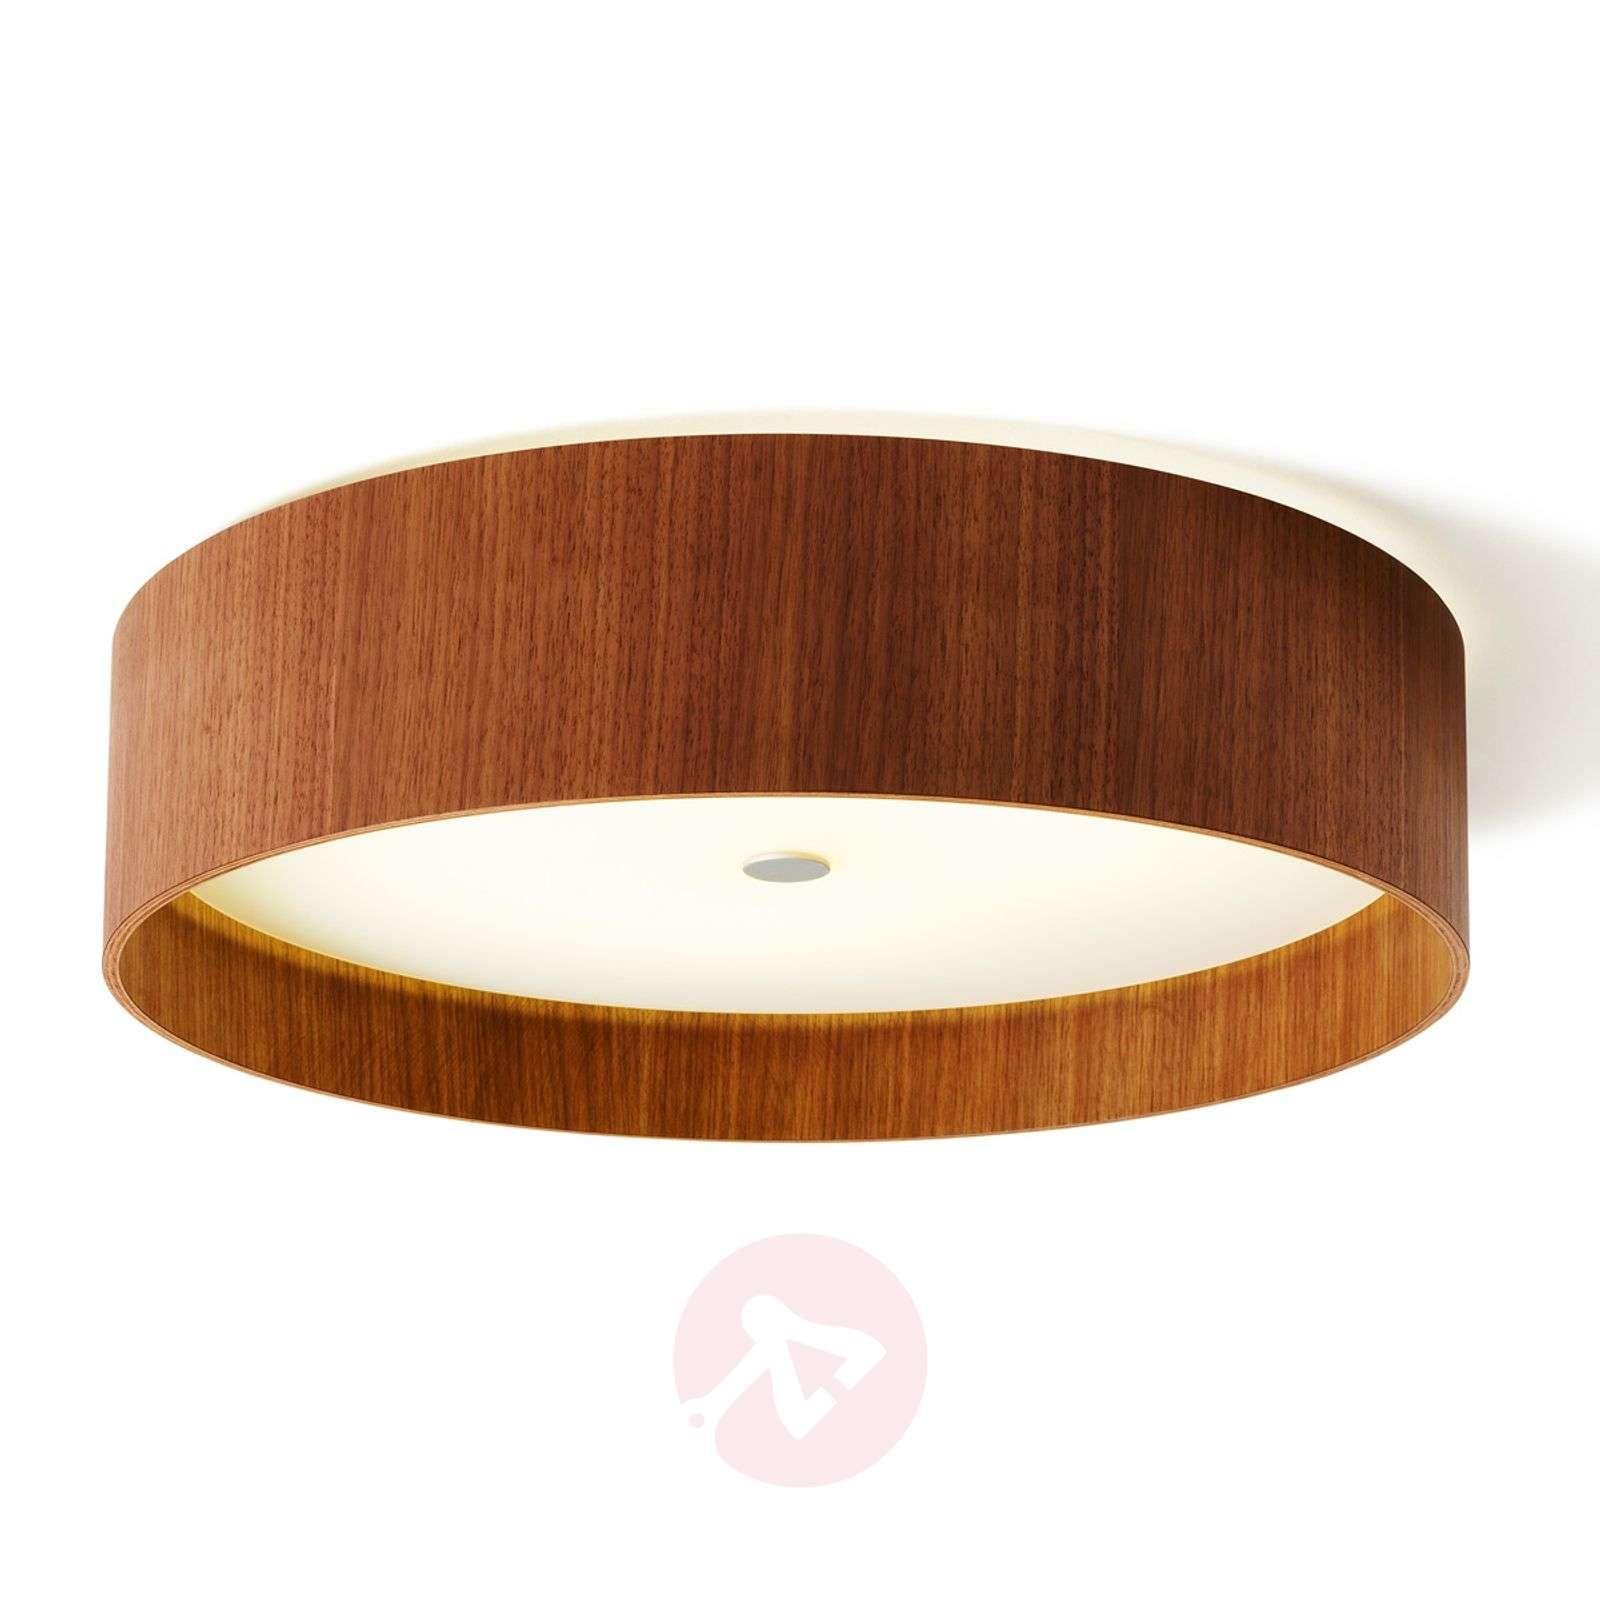 Lara wood LED-kattolamppu pähkinäpuusta 55 cm-2600505-01